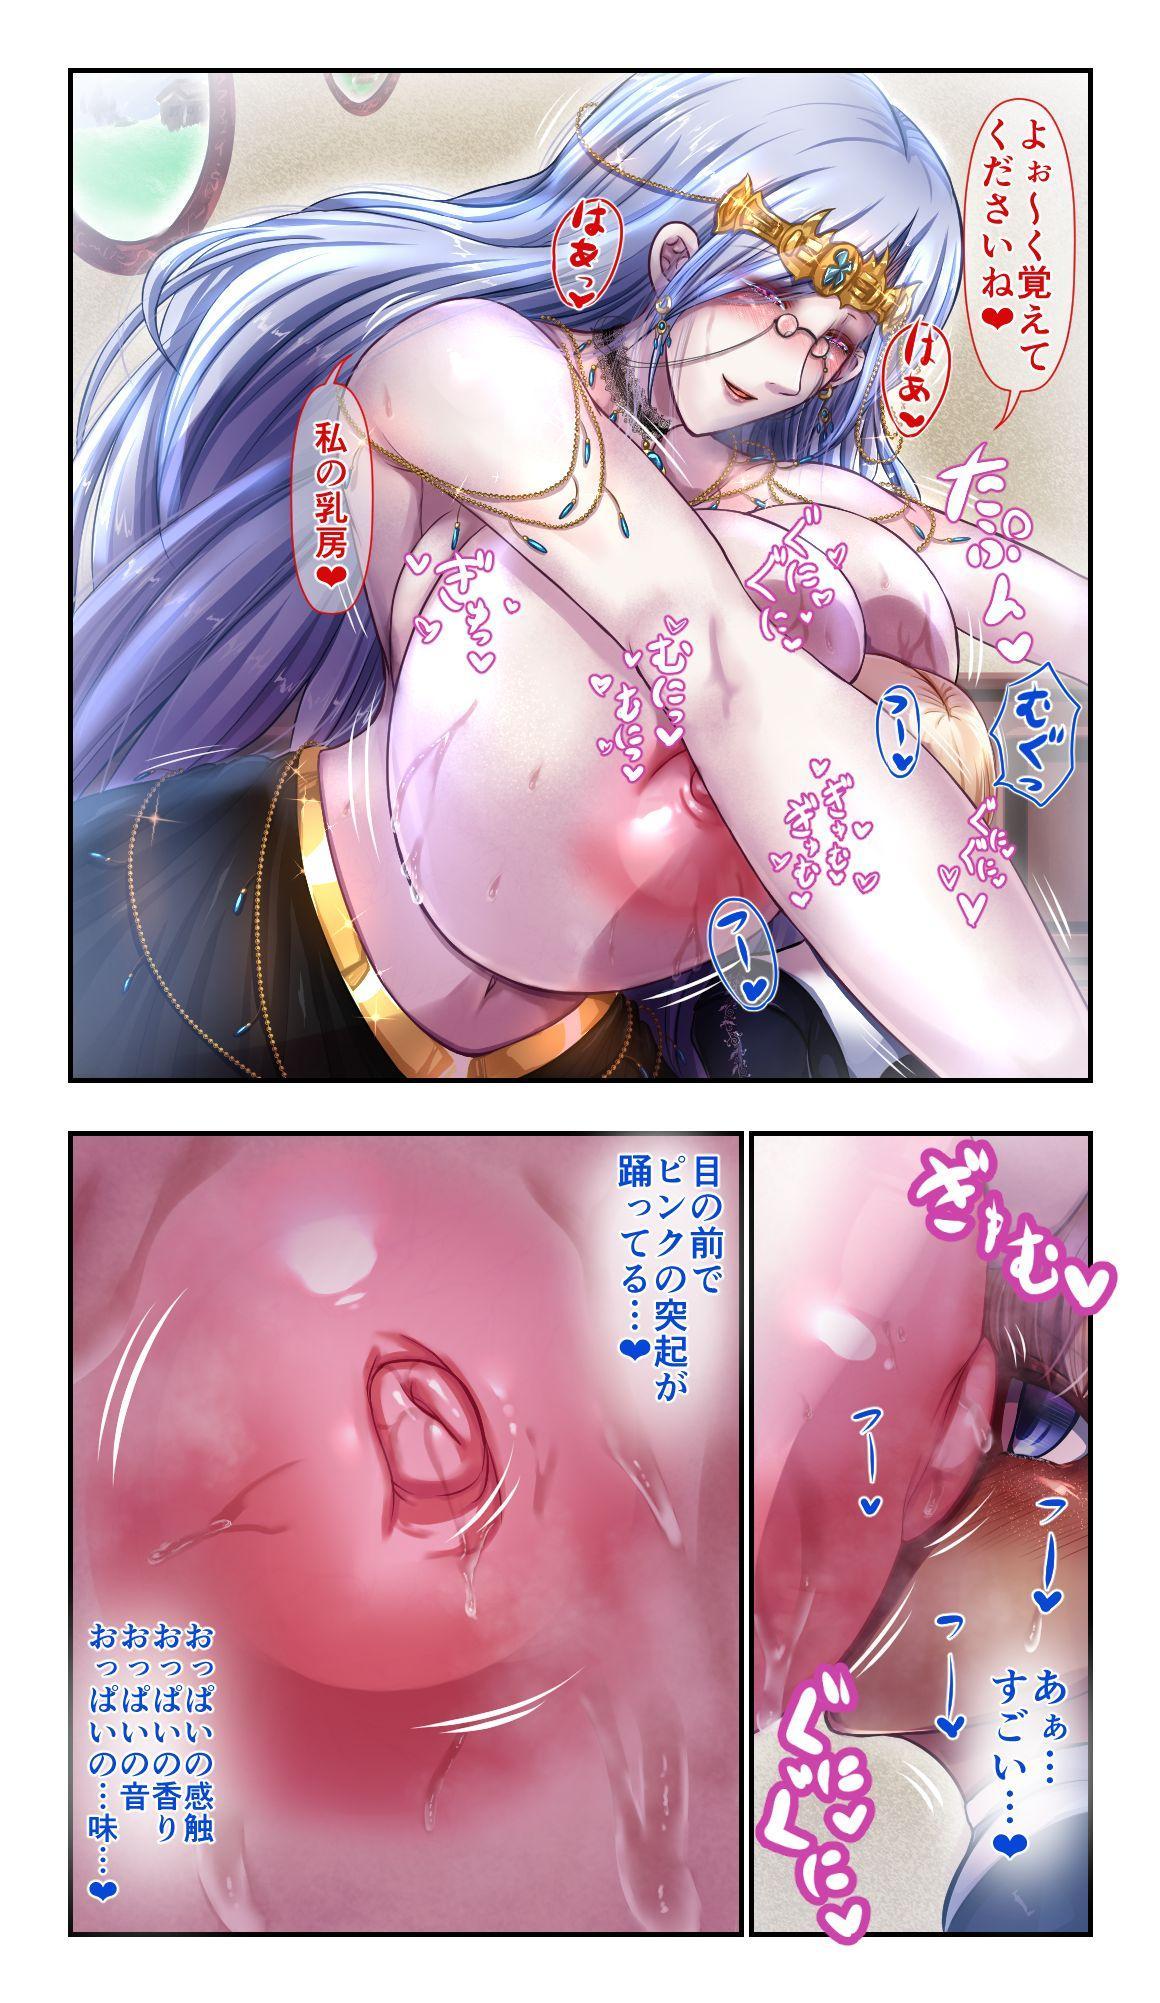 SweetEdda vol. 5 Nyuuma Hen Hitokui Chibusa no Mamelon 15